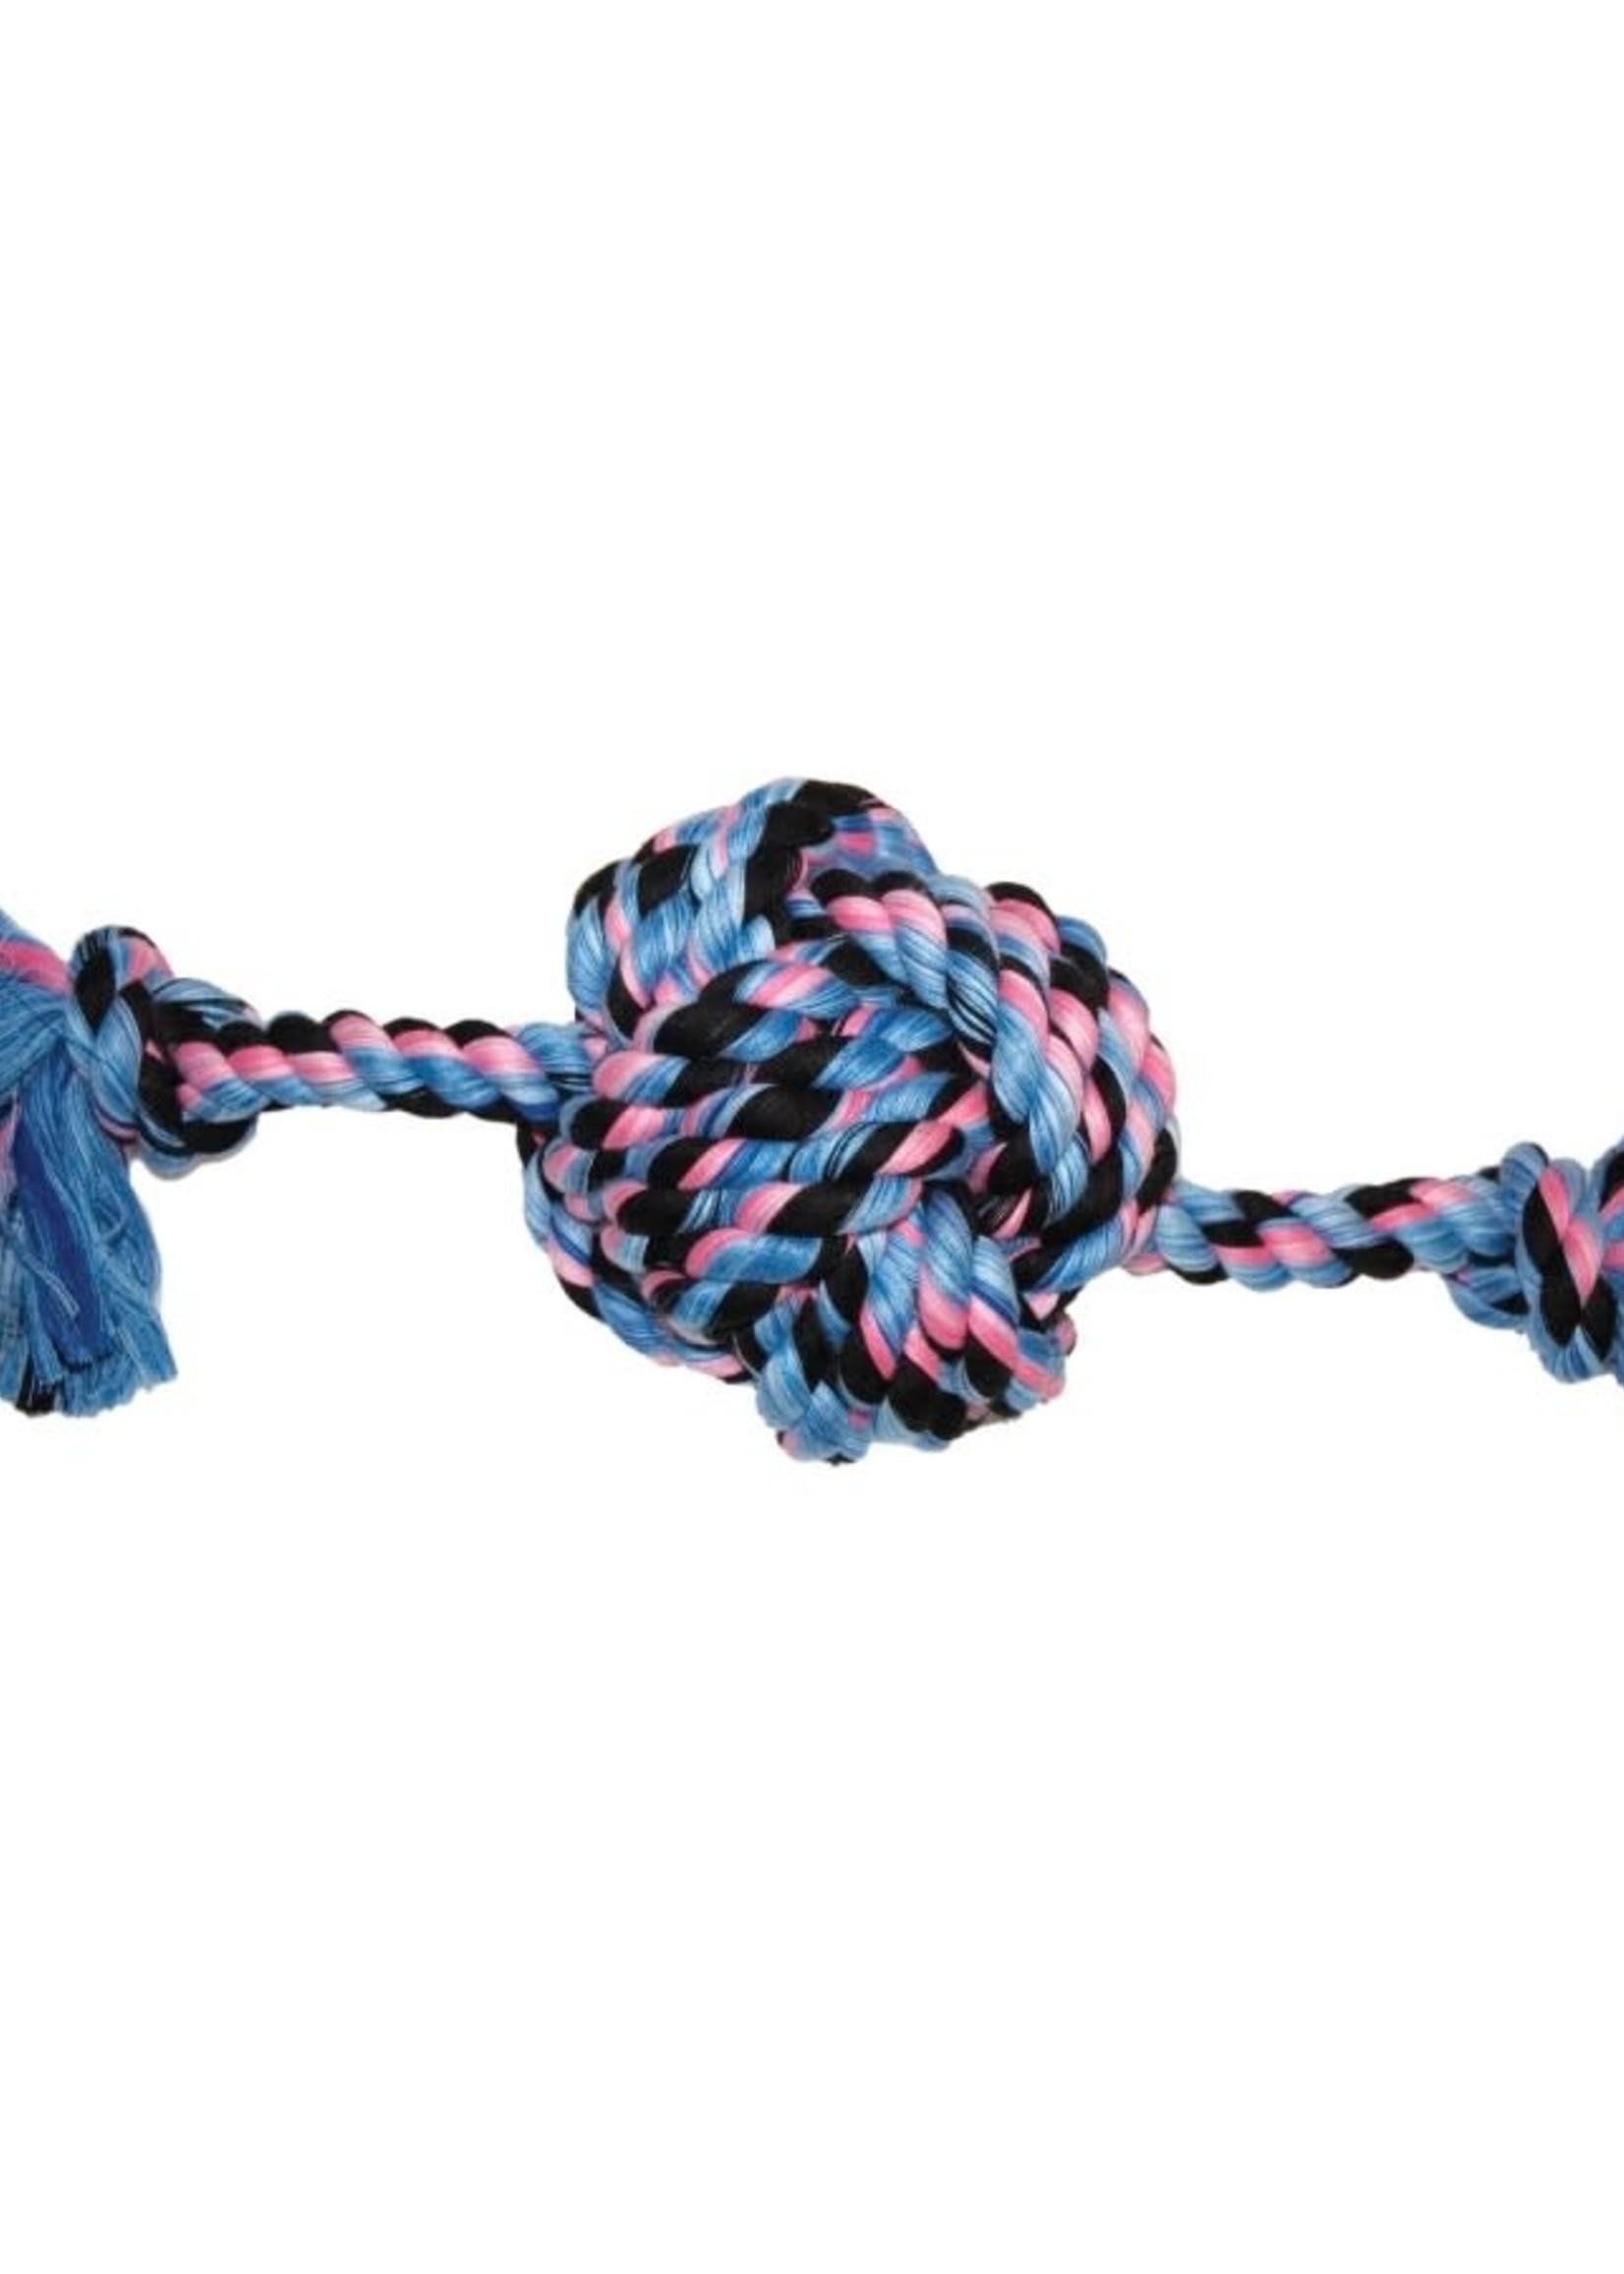 Mammoth Products Monkey Fist Rope - Medium